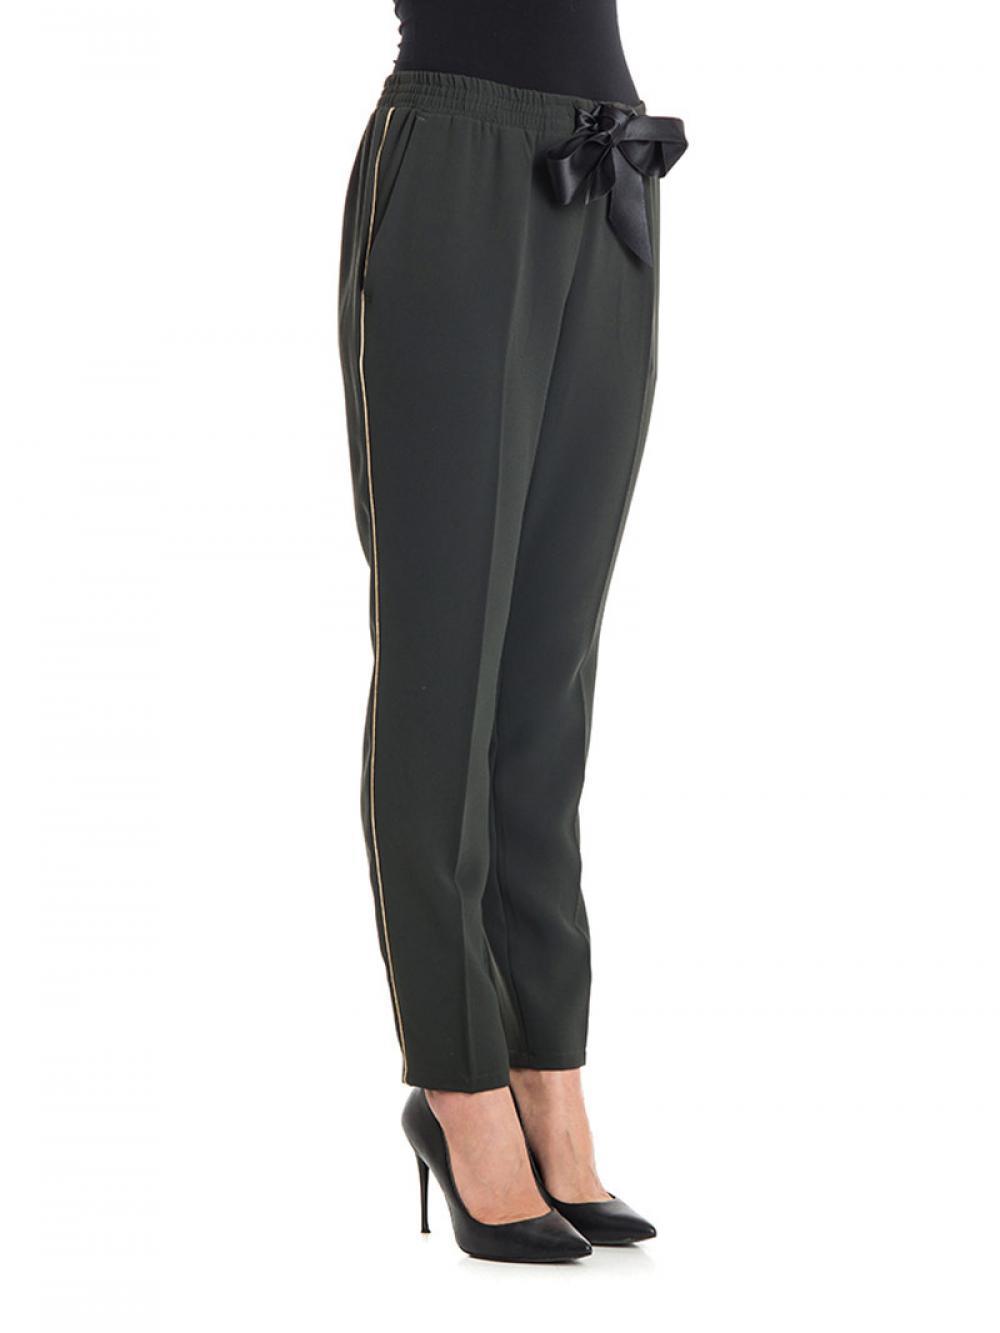 pantalone-jogging-donna-liu-jo-cod-c67118